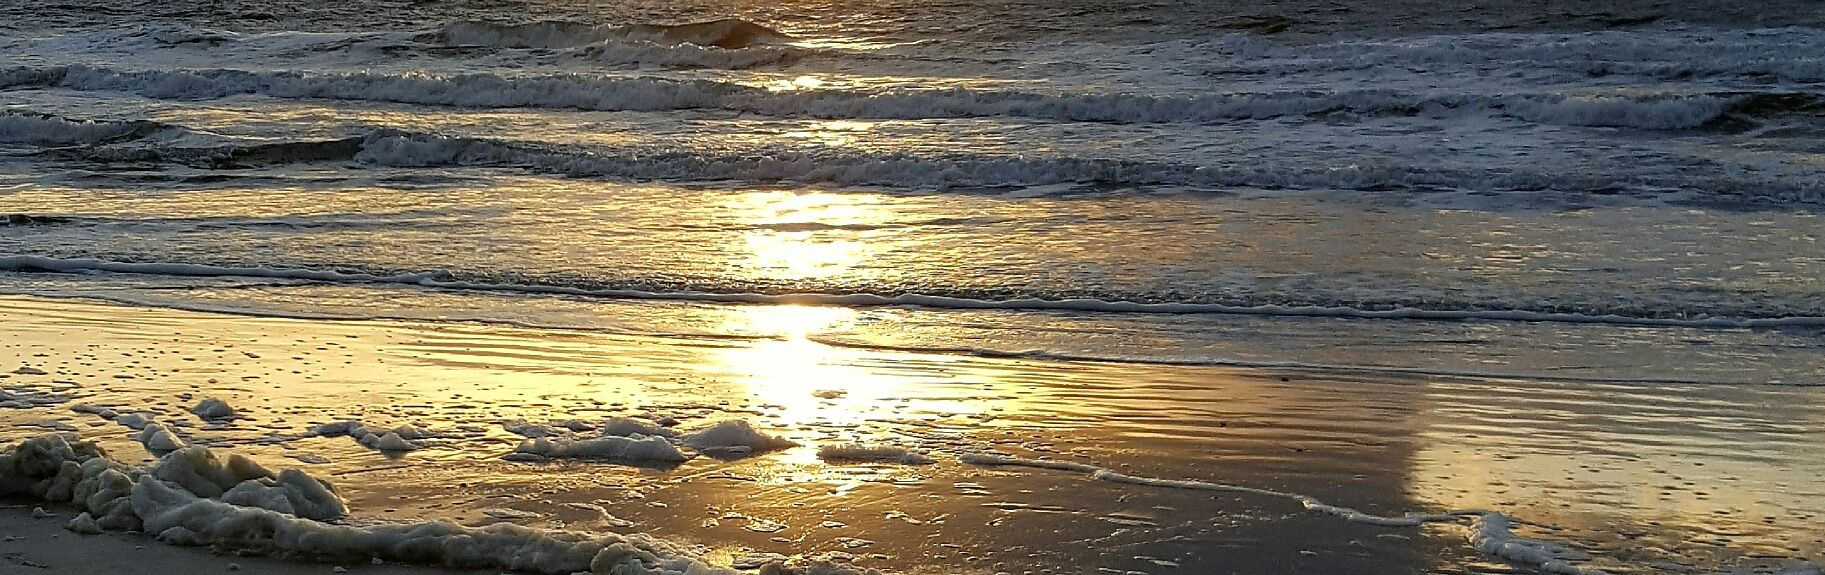 Amelia Landings (Fernandina Beach, Florida, United States)